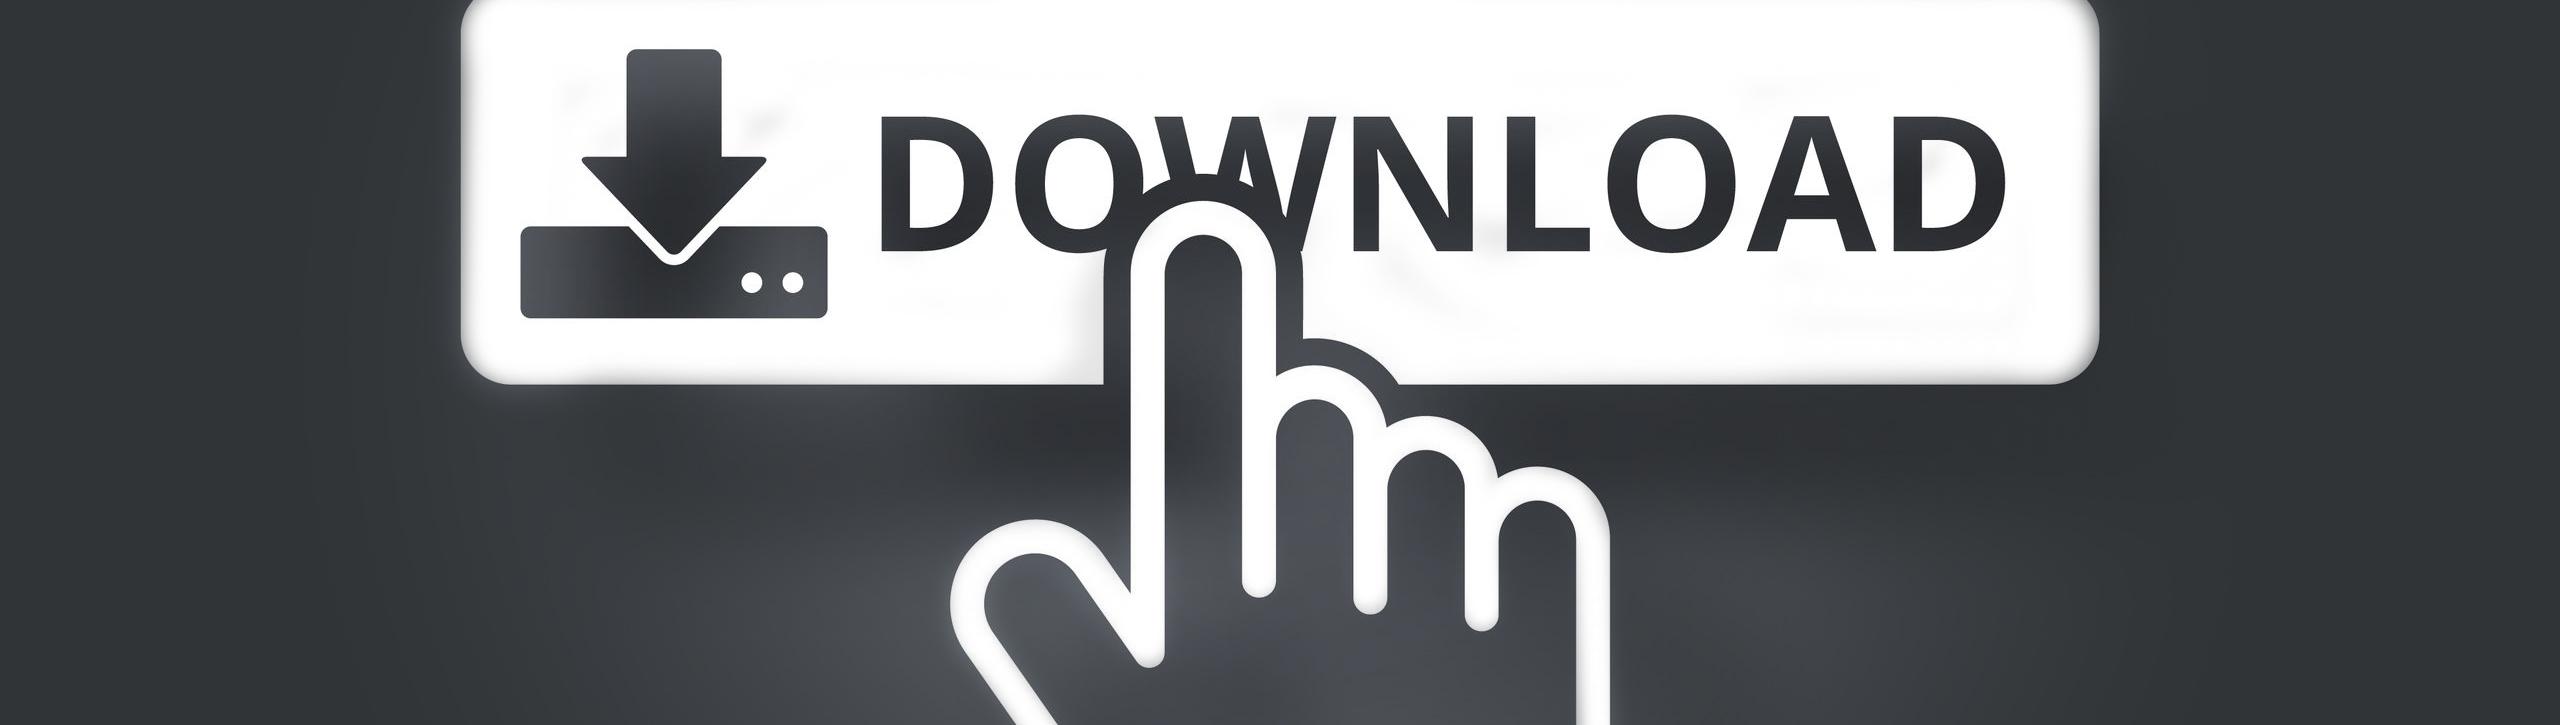 Download – Toni Ungelert Bauunternehmen, Bild: donets/123rf.com